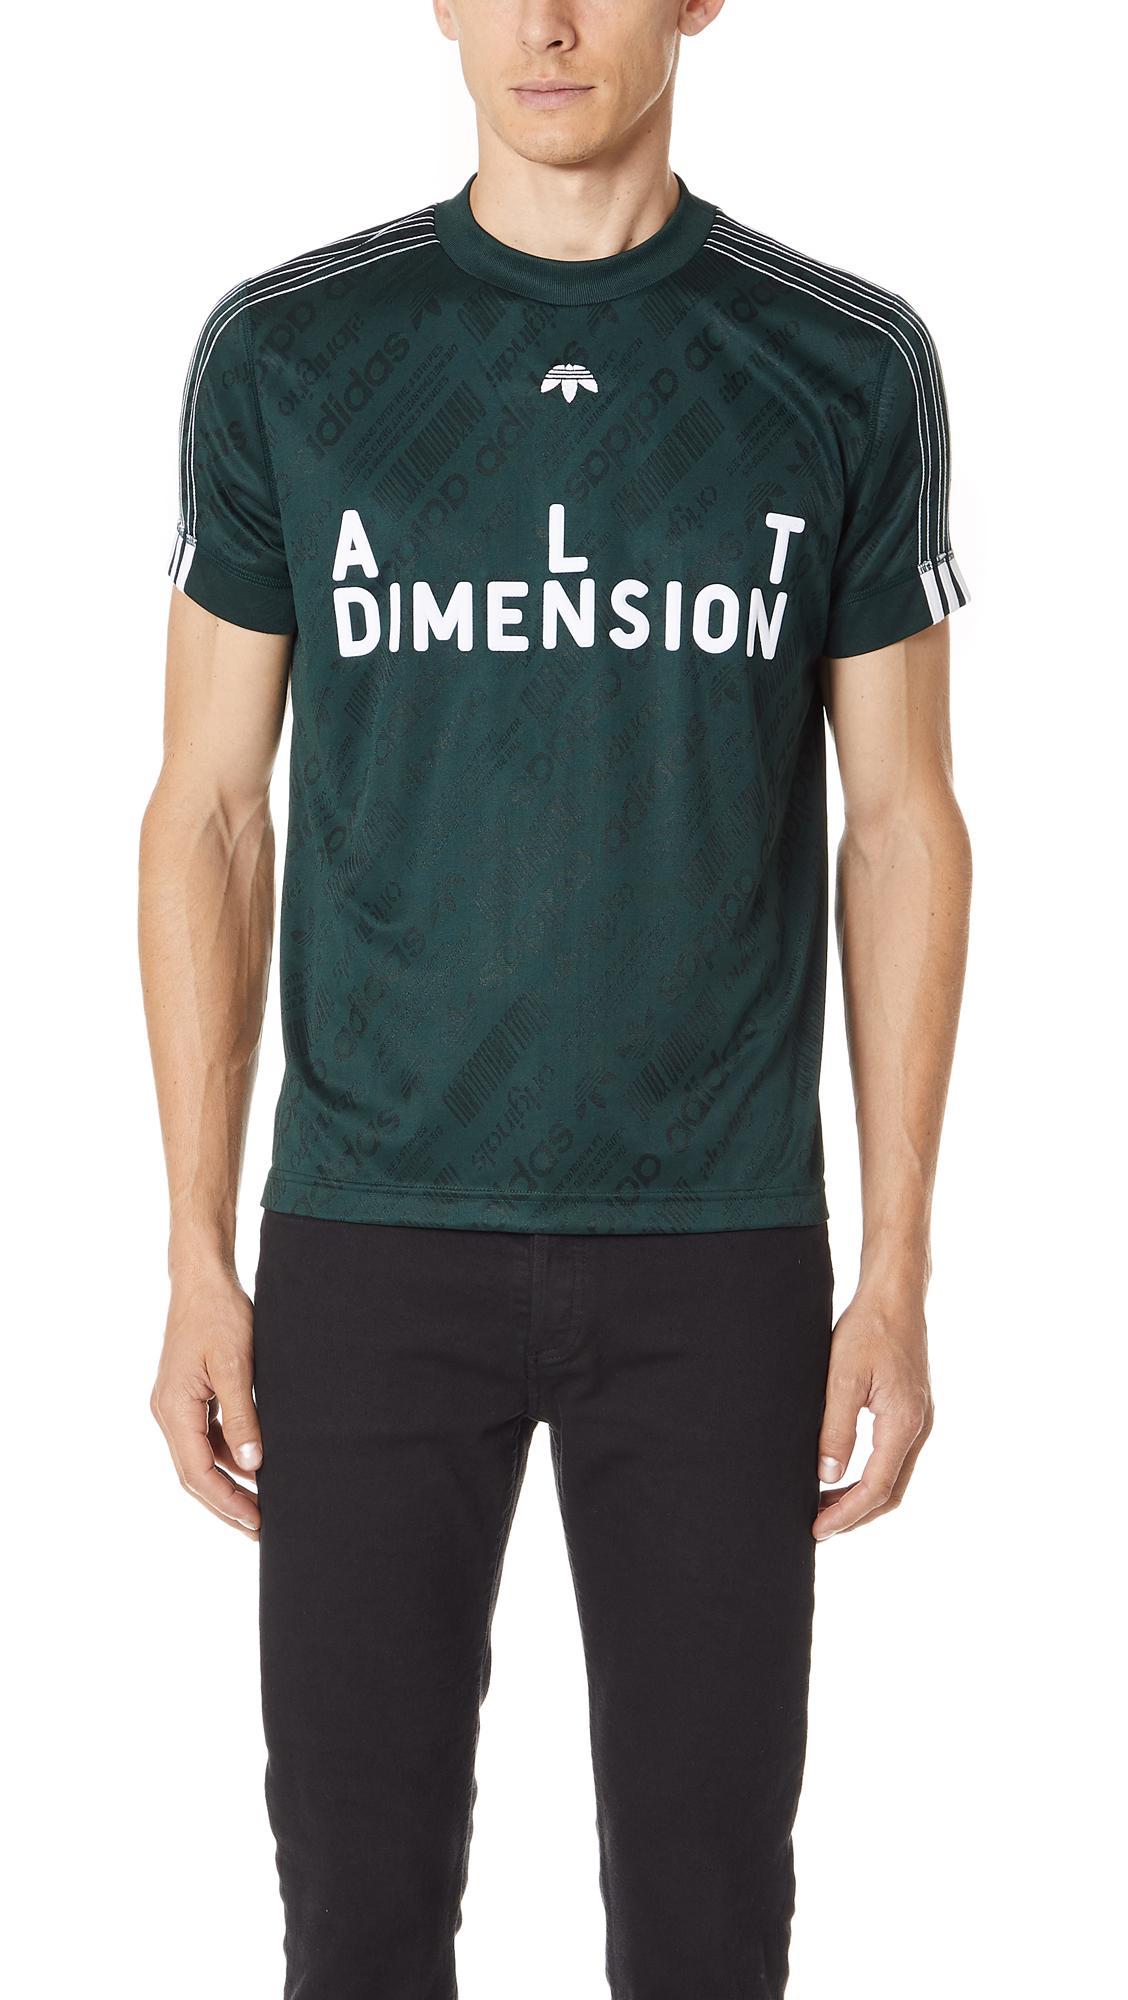 super popular c1d15 0e0b0 Adidas Originals By Alexander Wang Alt Dimension Slim Fit Soccer Jersey In  Green Night